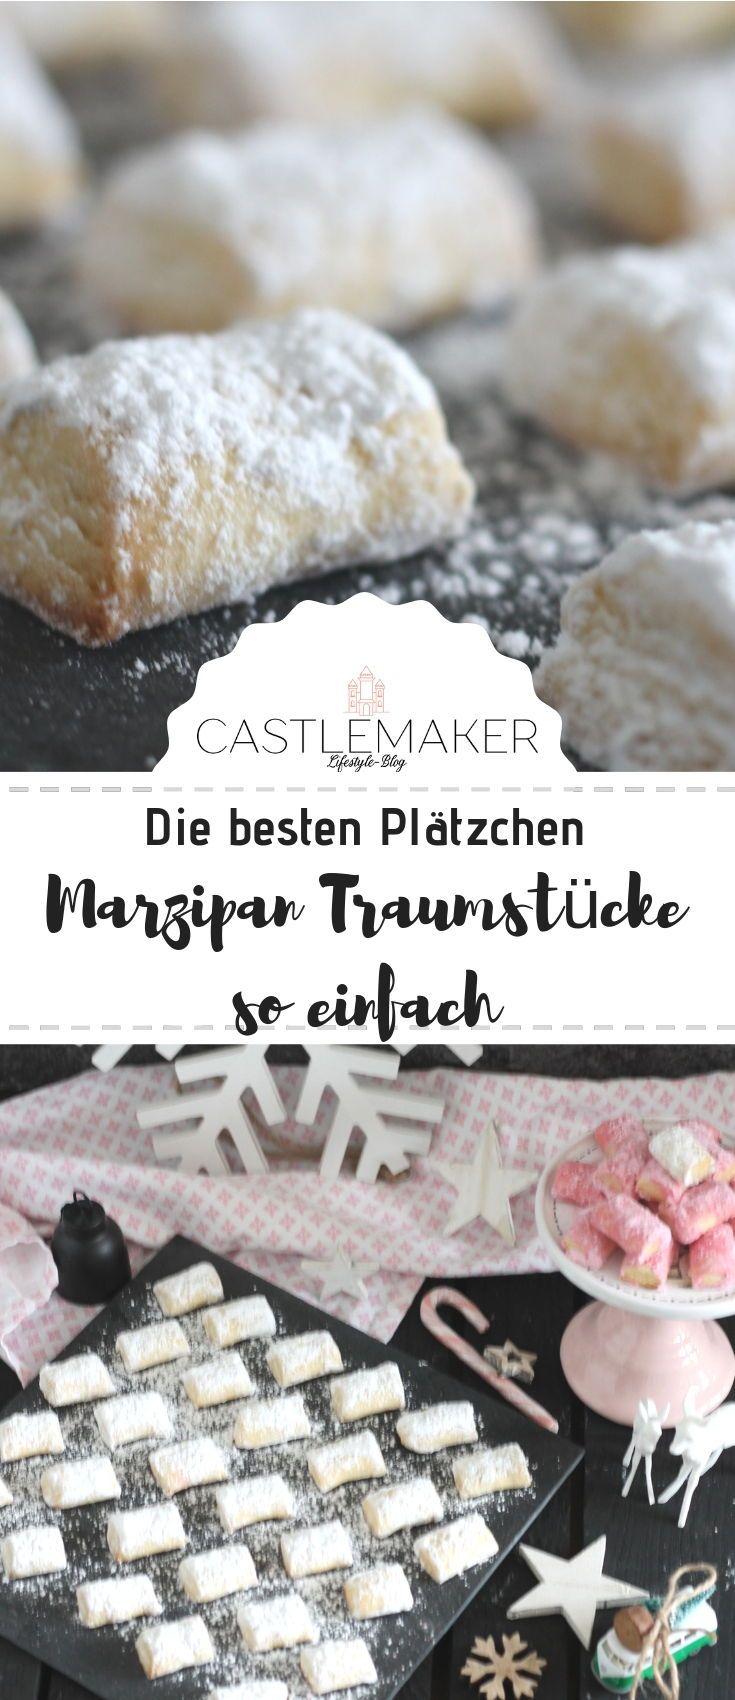 Traumstücke mit Marzipan / Marzipankissen / Plätzchenrezept « CASTLEMAKER Lifestyle Blog